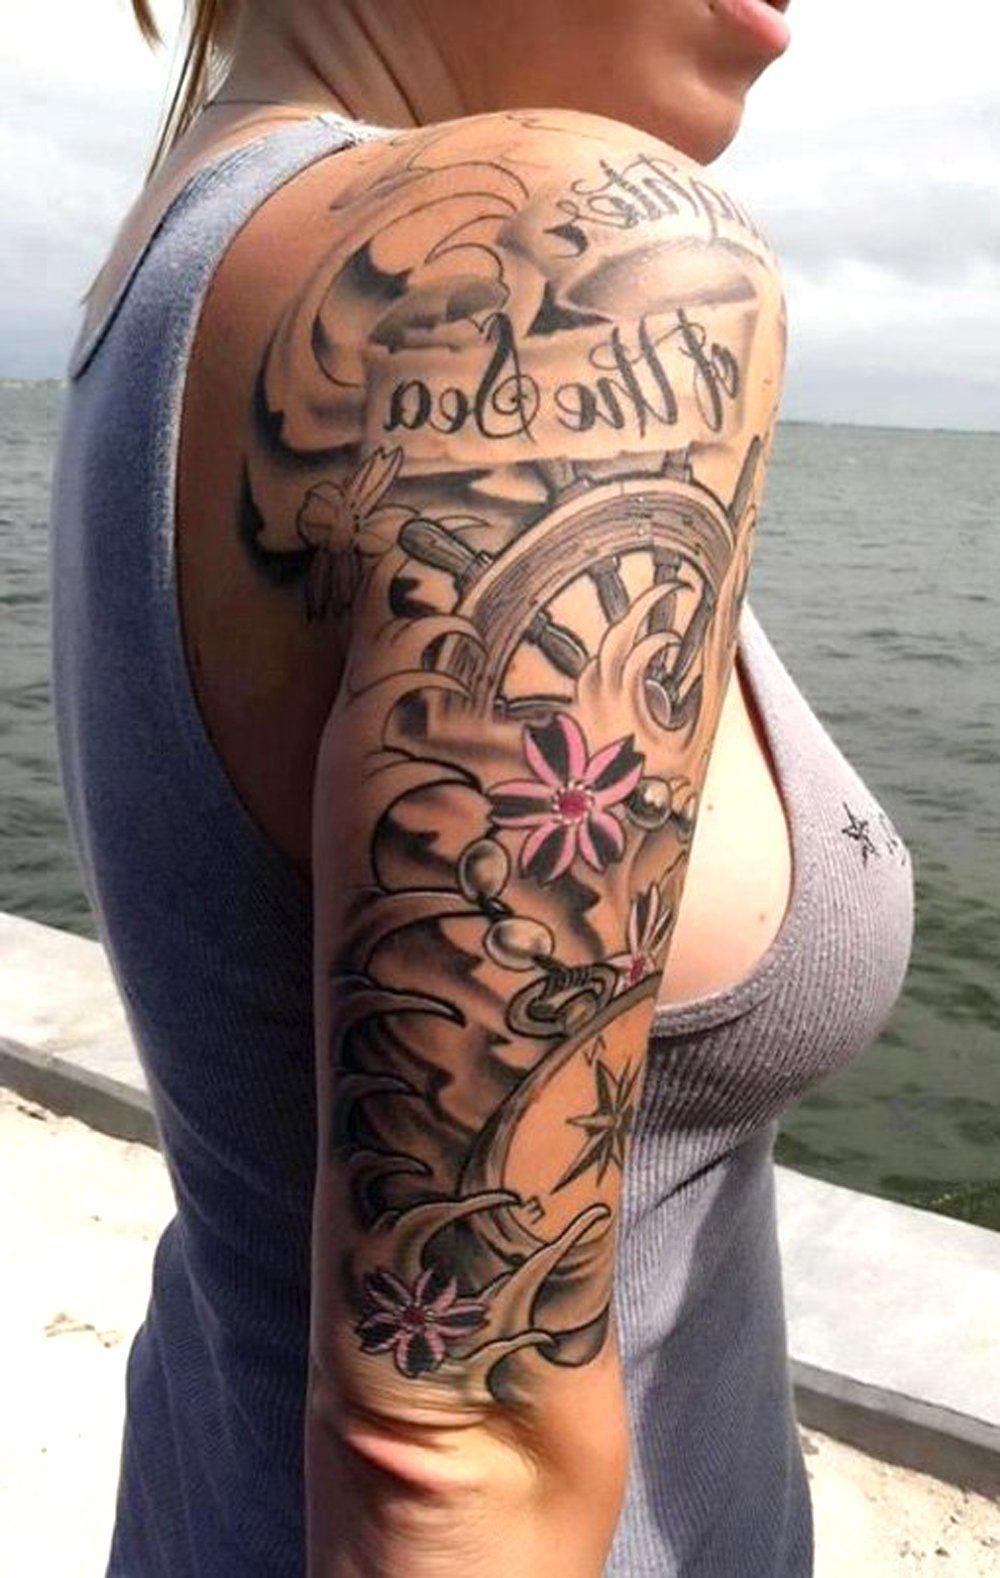 Black Full Arm Sleeve Tattoo Ideas For Women Sea Flower Rudder